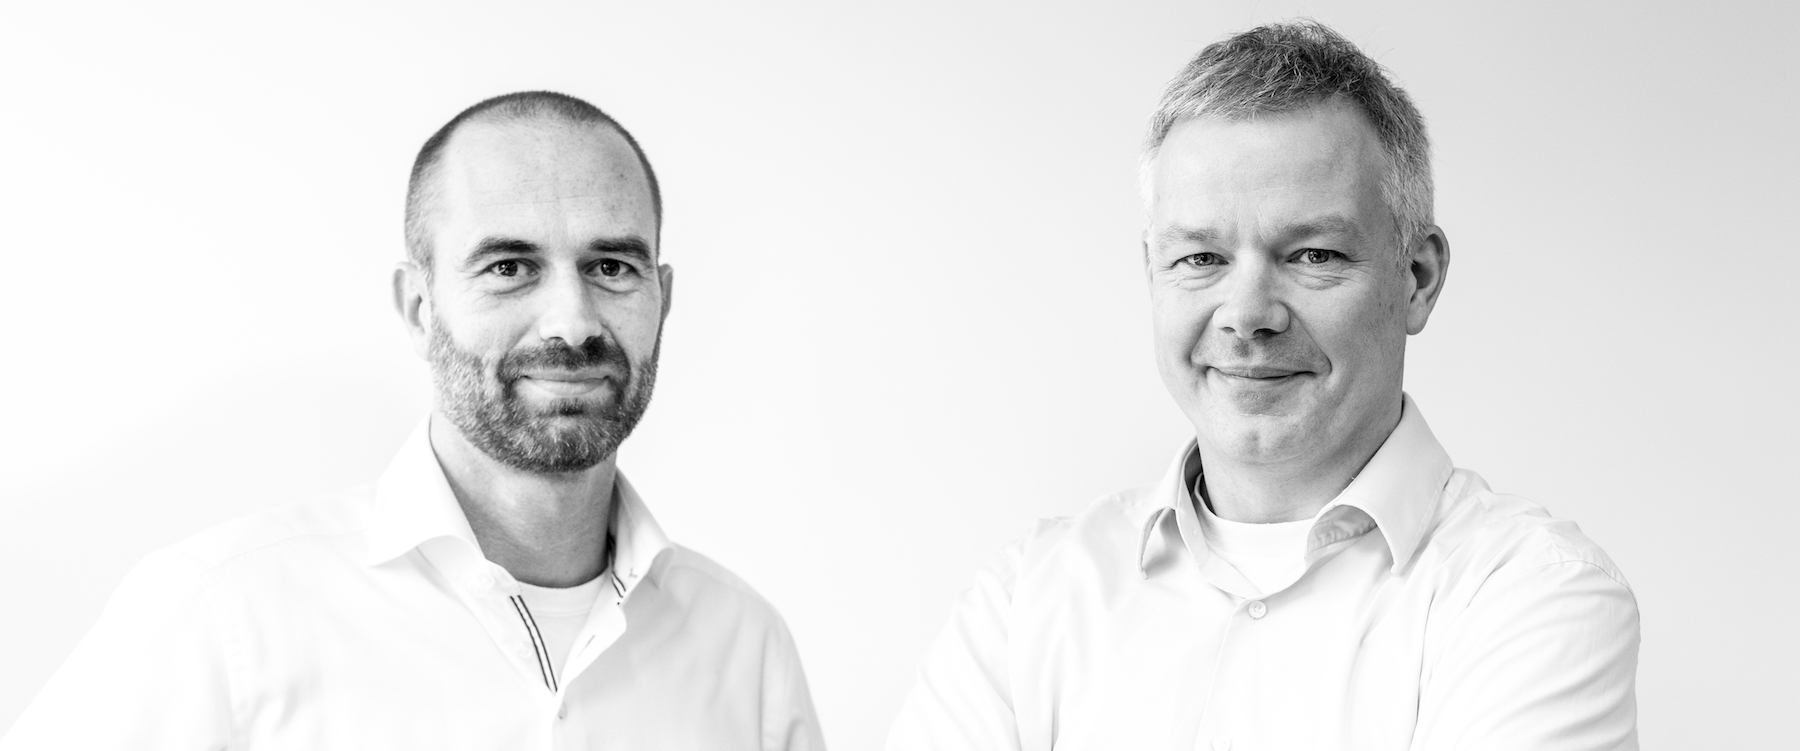 IoT startup Triggi raises €1.1M from Talpa media exec Pim Schmitz